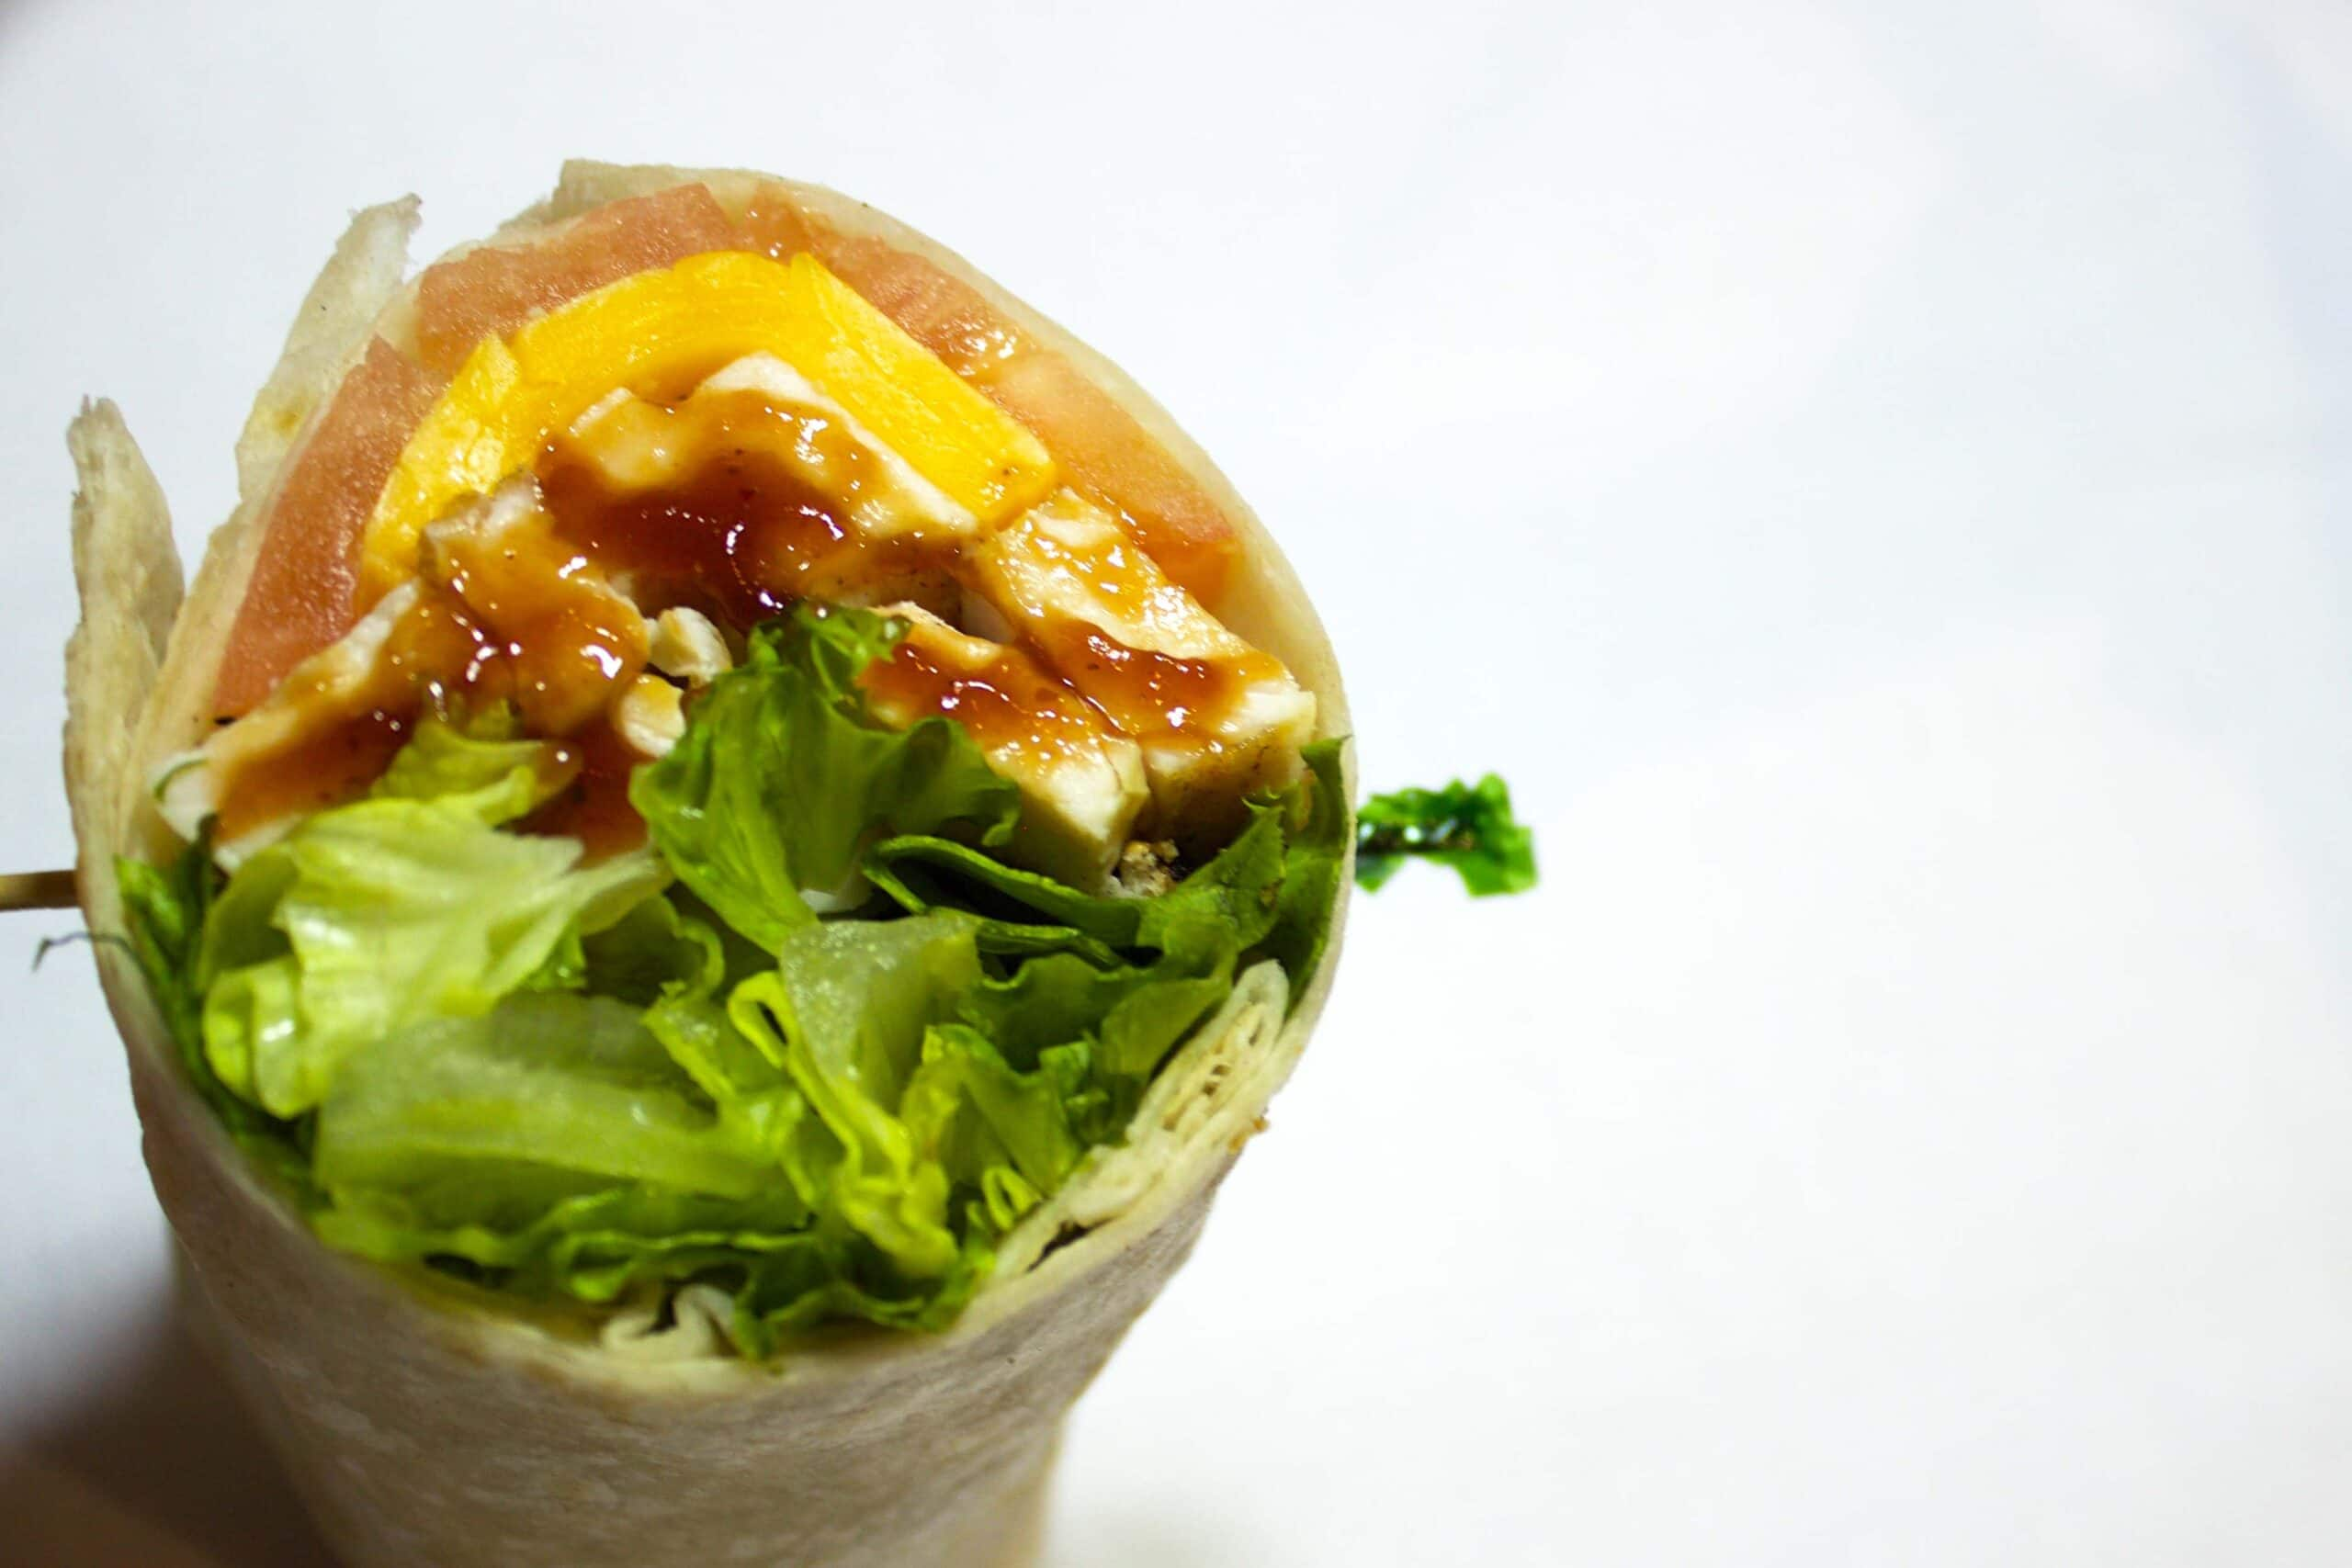 sandwiches in kenosha, kenosha pub, kaiser's of kenosha